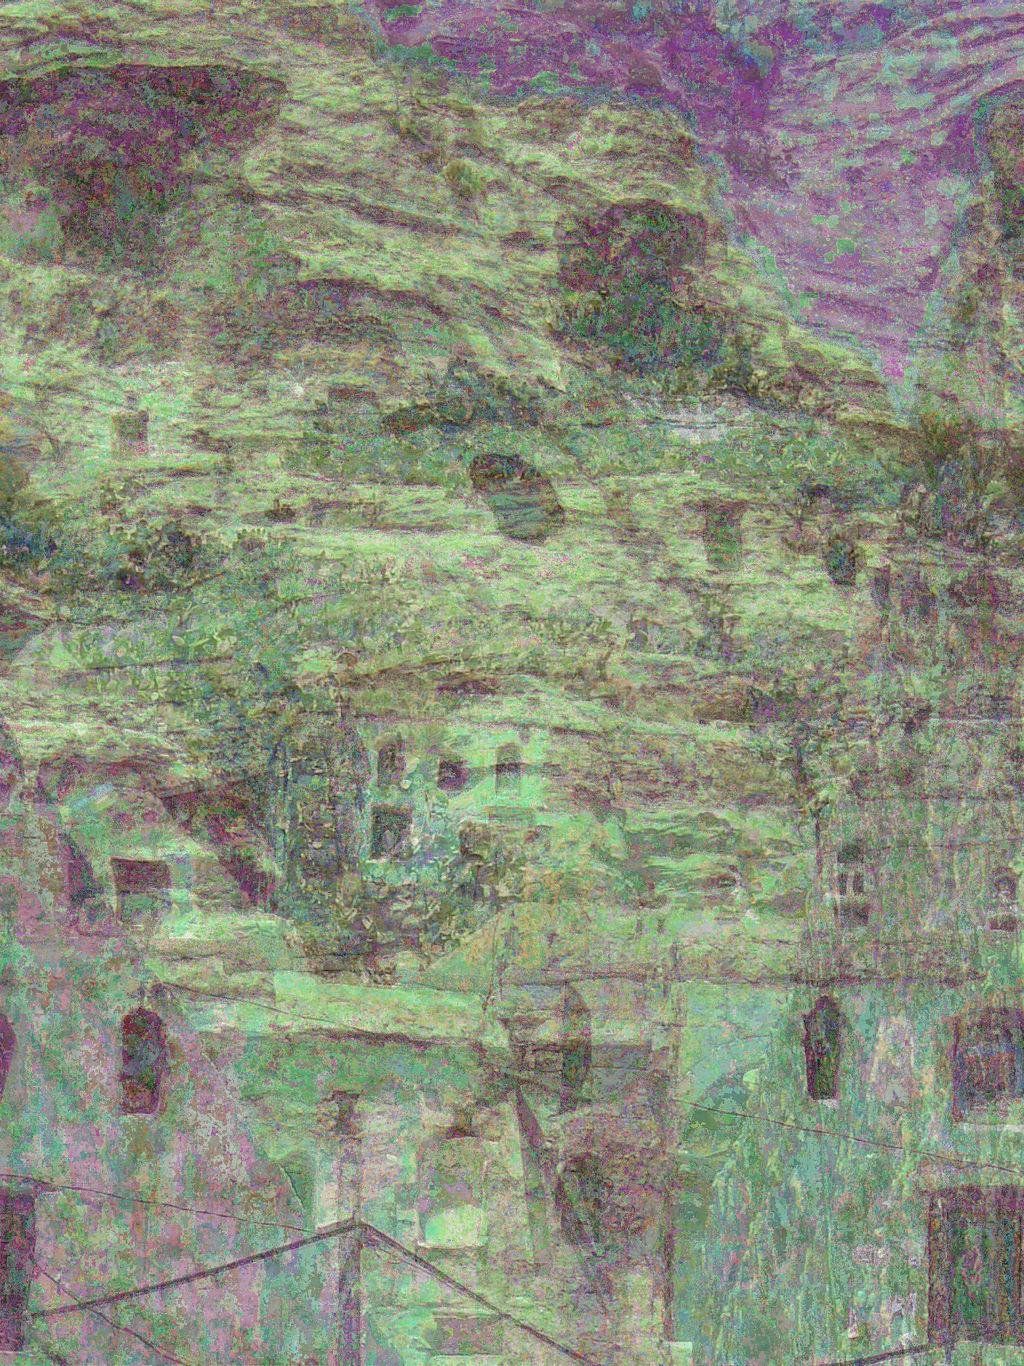 Rock dwellings above Shibam by marjoleink